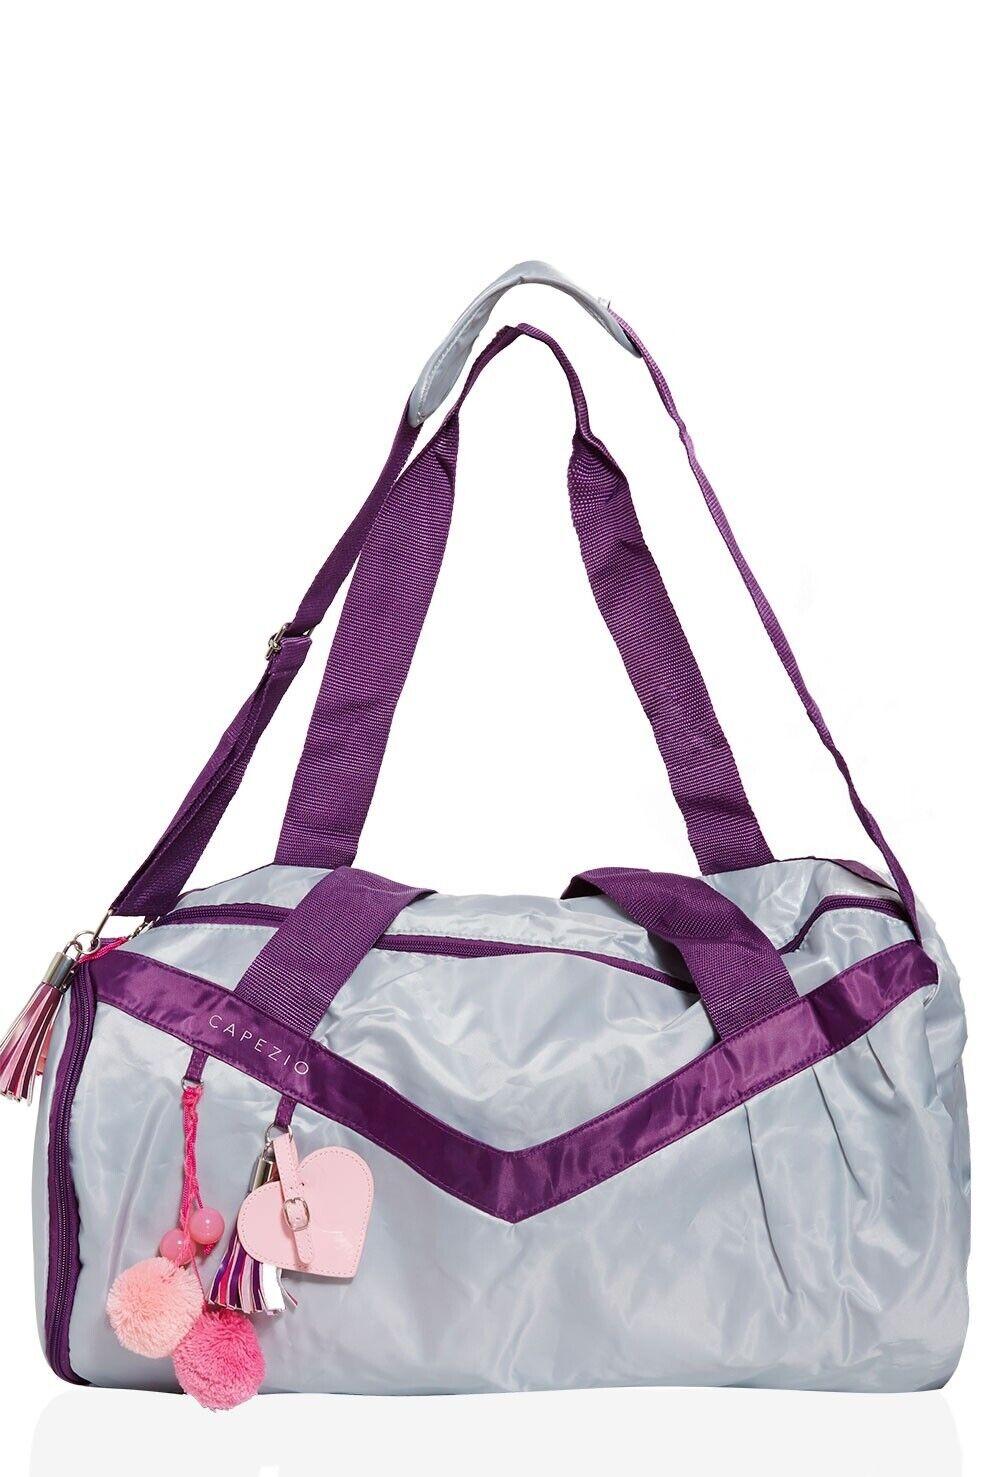 Capezio Totally Charming Duffle Dance Bag